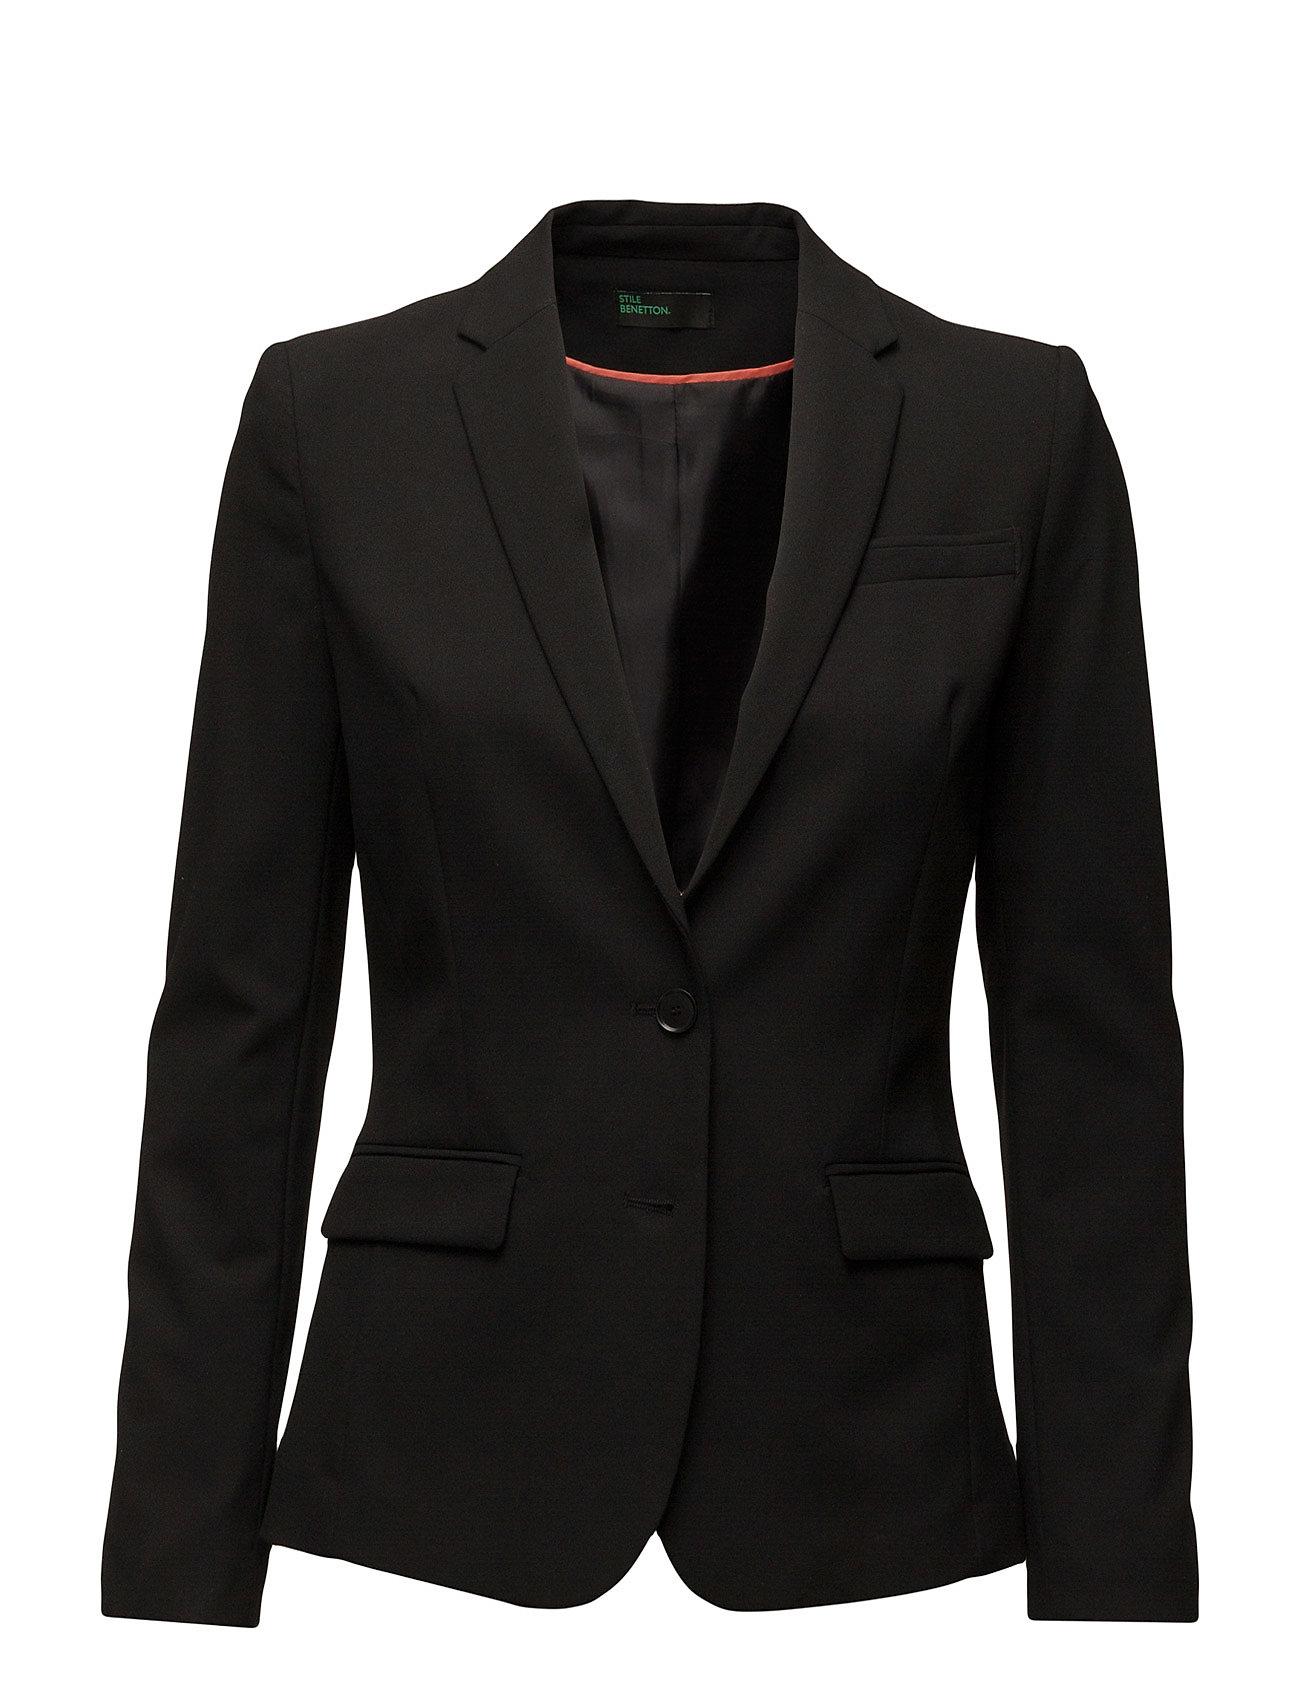 Jacket United Colors of Benetton Blazere til Damer i